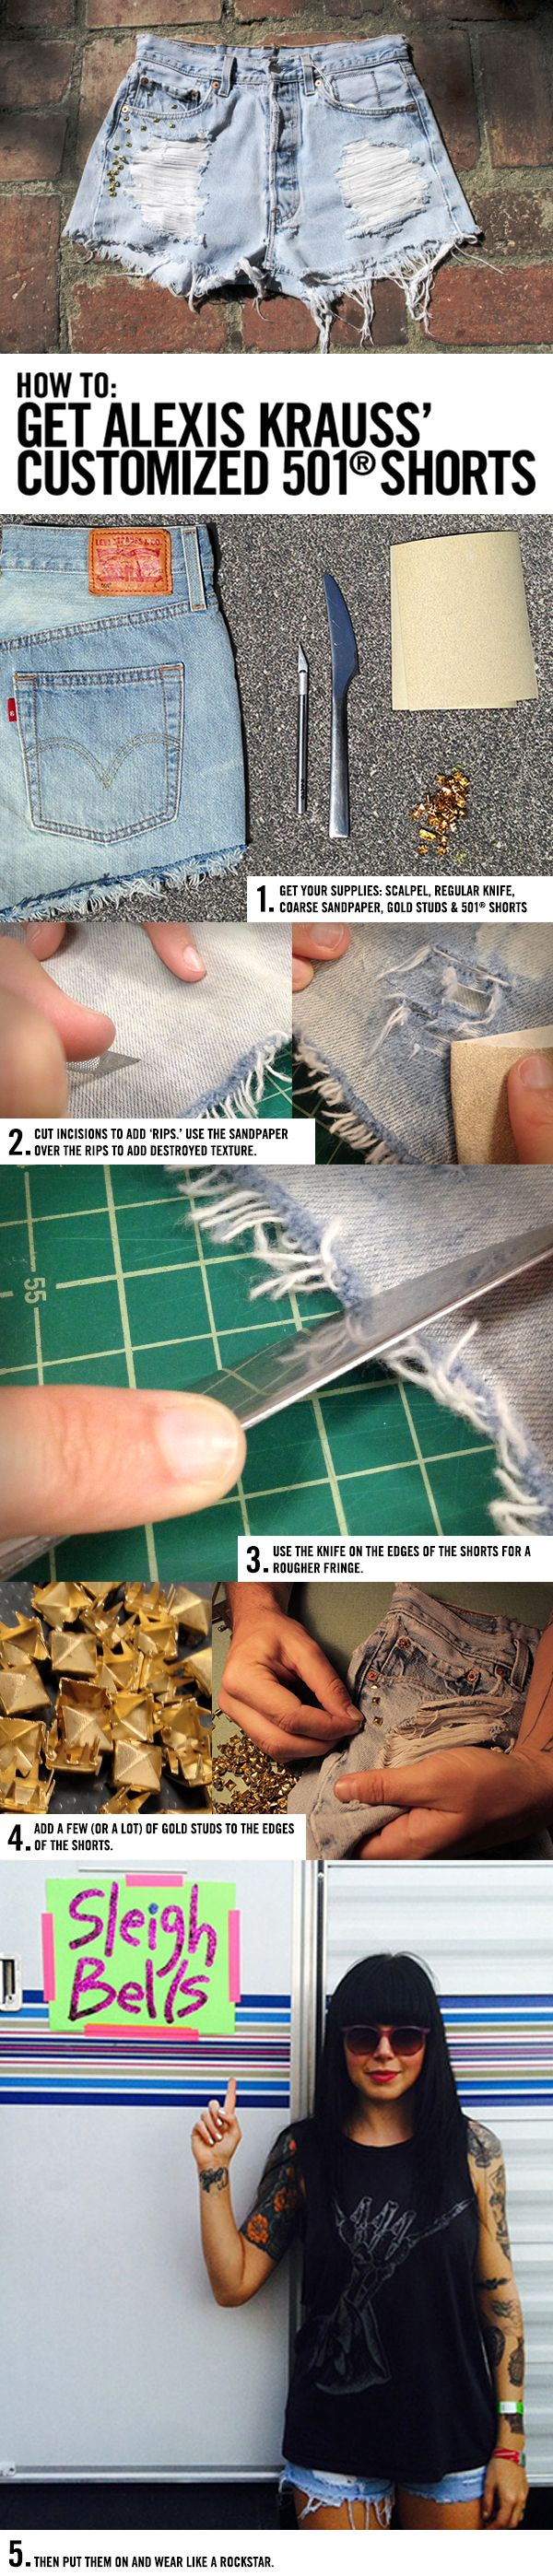 How to get Sleigh Bells' Alexis Krauss' Customized 501 Shorts    http://us.levi.com/family/index.jsp?ab=Women_leftNav_Categories_shorts_501shorts&categoryId=35193626&cp=3146849.3146909.4011526